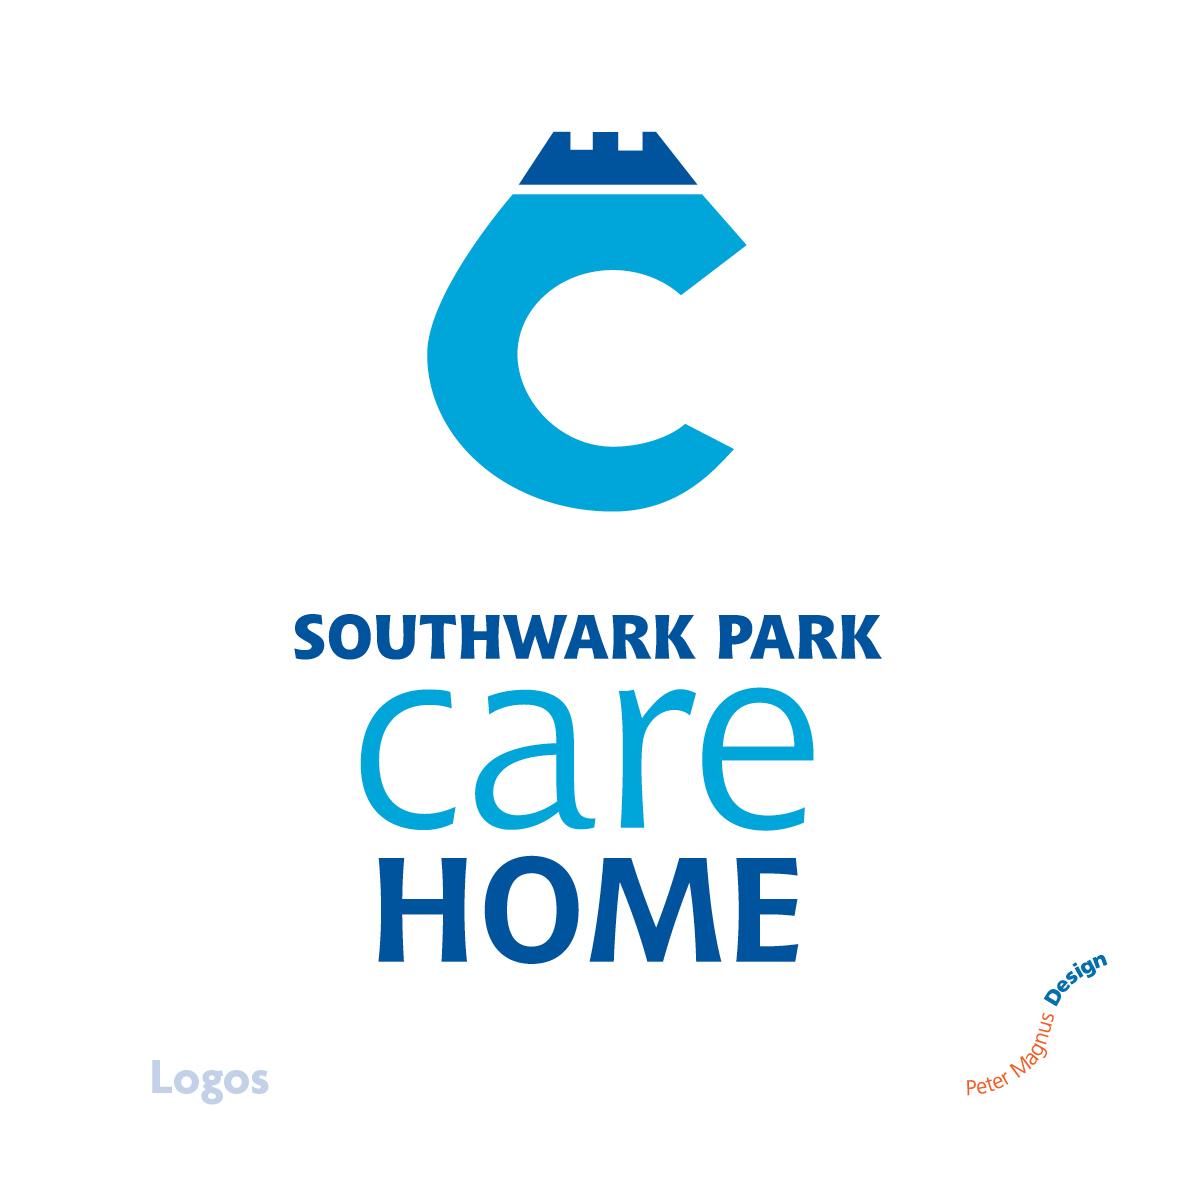 Southwark Park Care Home logo, Southwark, South London